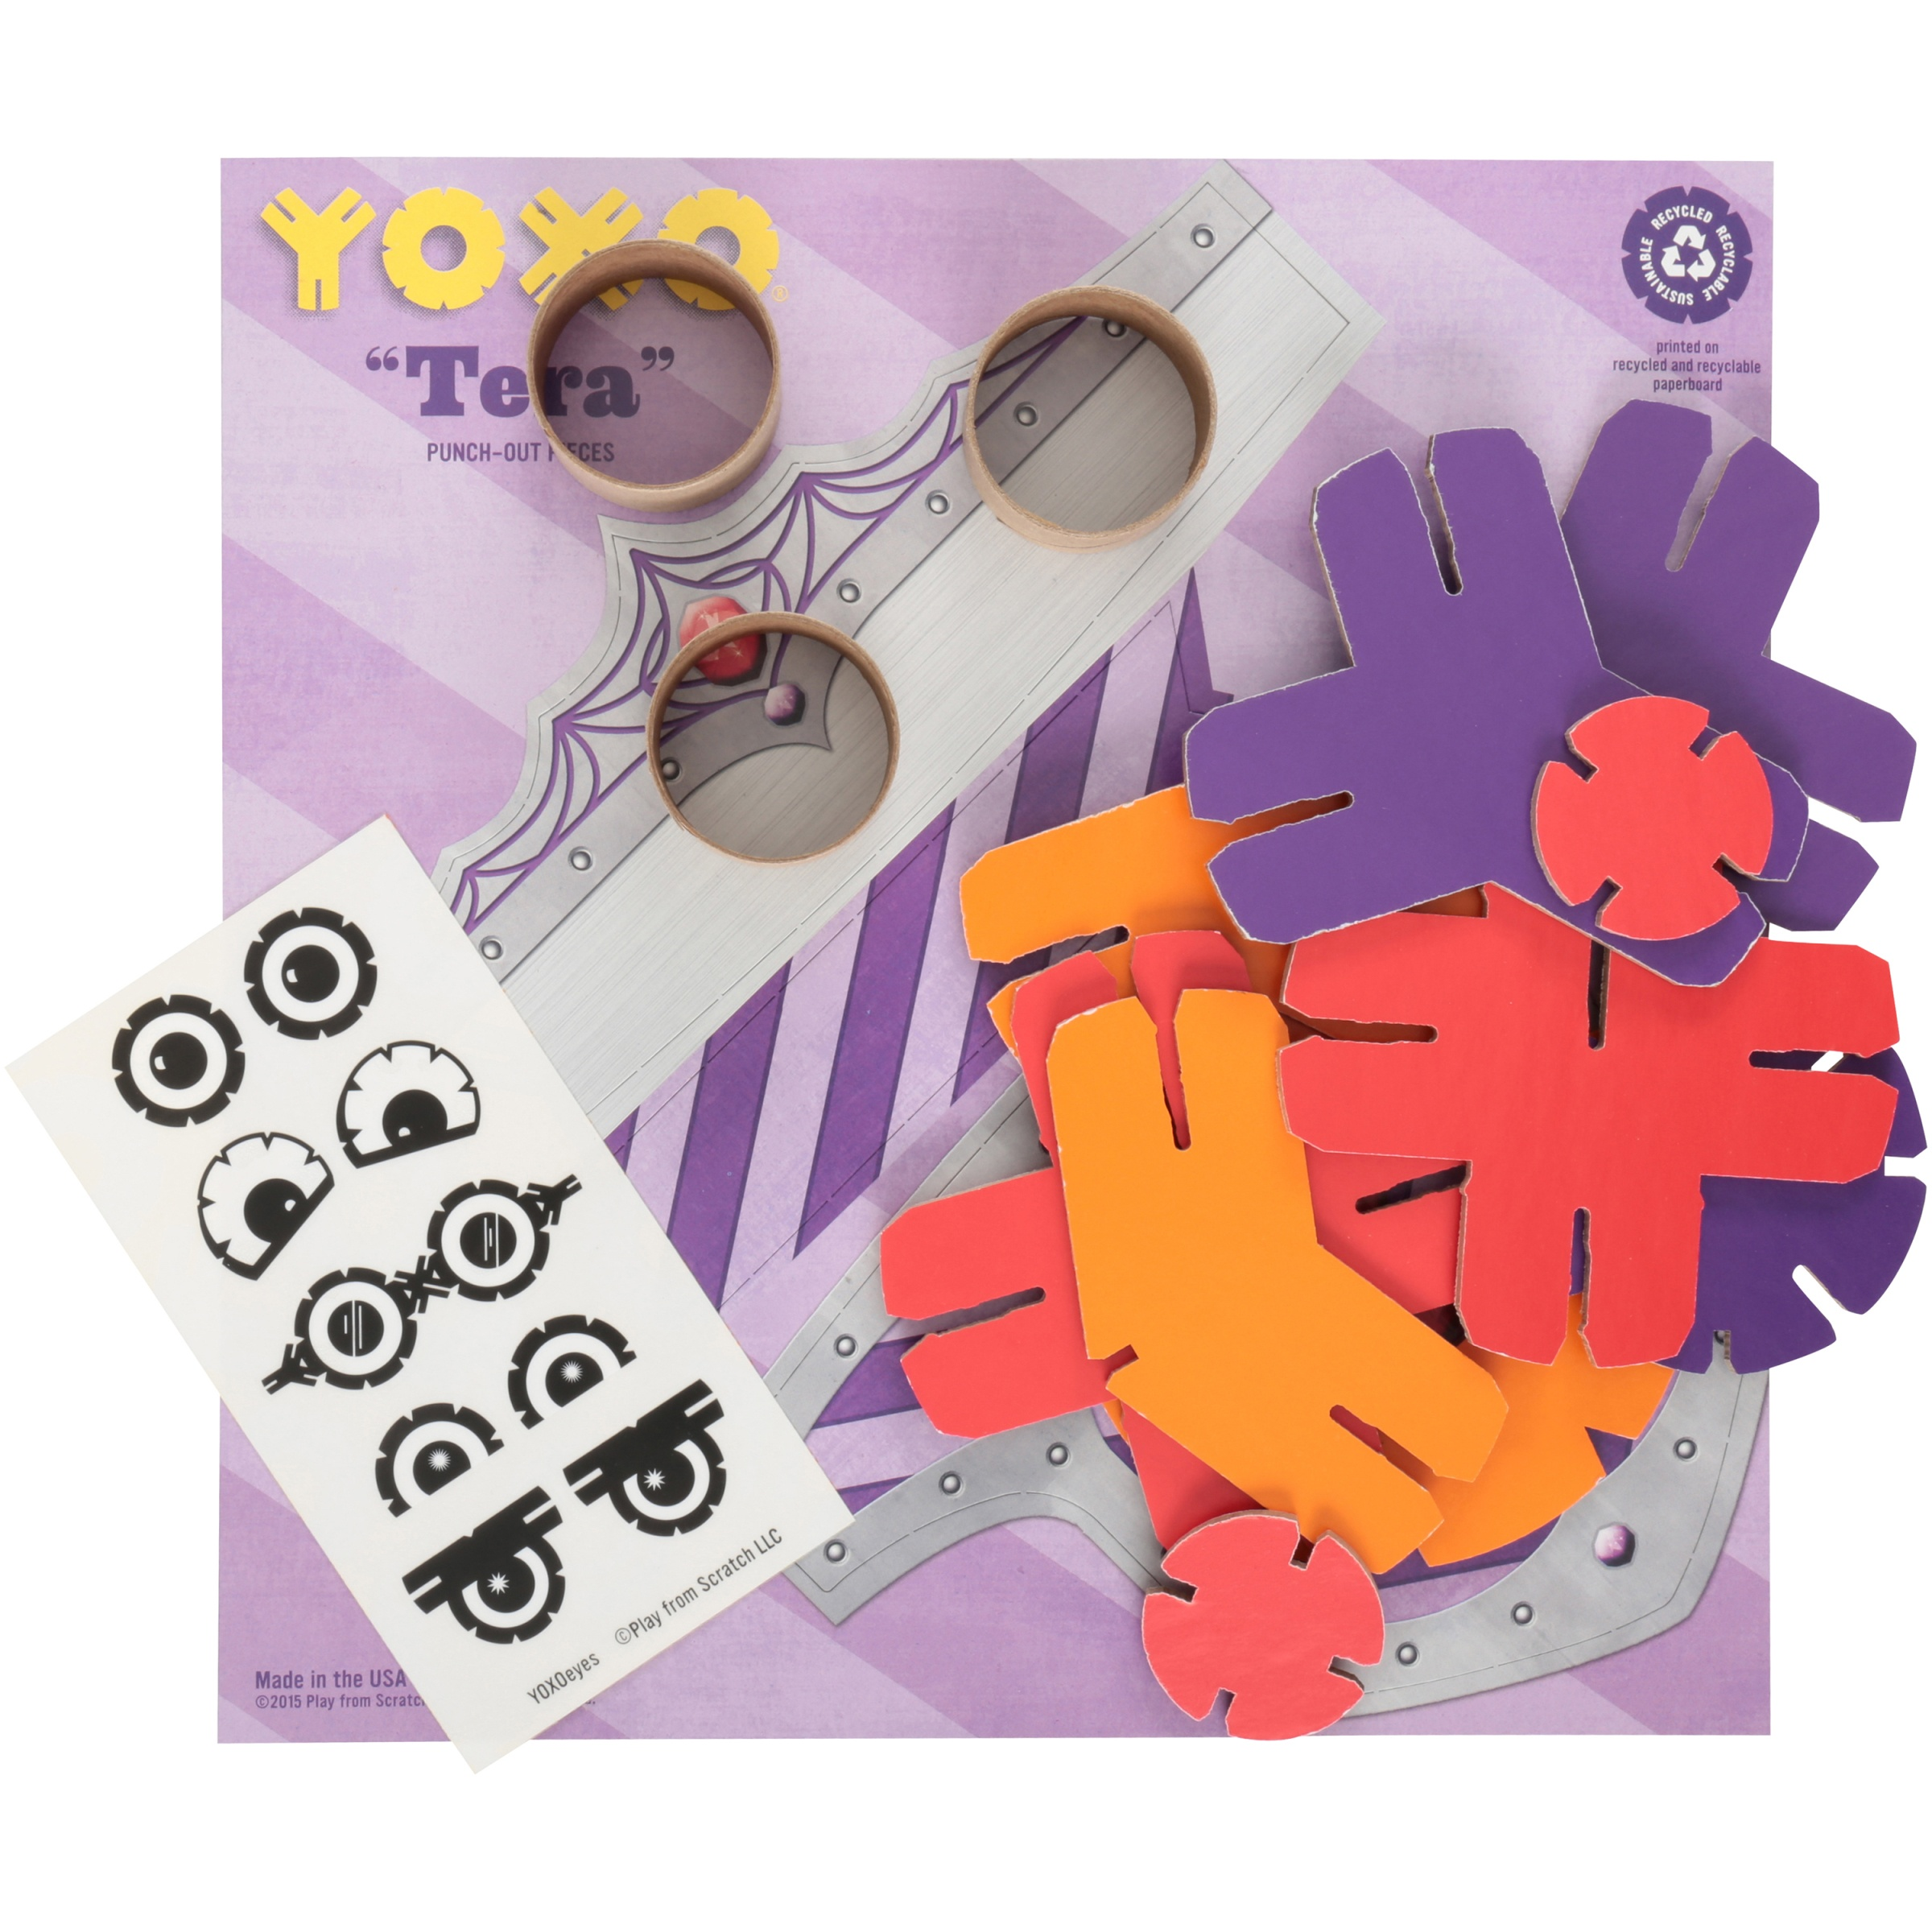 Yoxo Intermediate Tera 18 Inch Tall Robot Toy Construction System Kit 39 pc Box by Yoxo